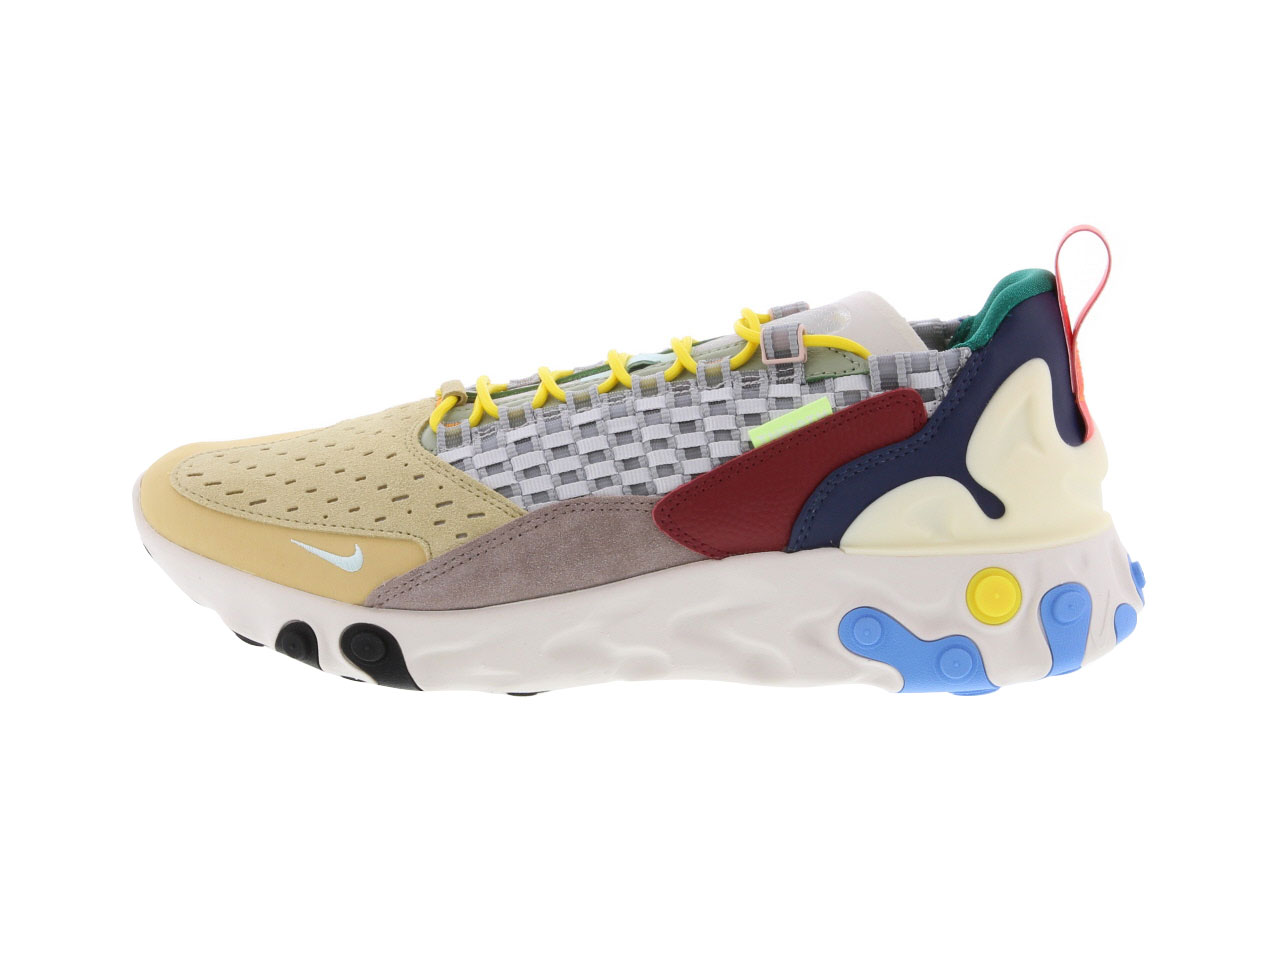 【OUTLET特価】NIKE REACT SERTU(AT5301-001)【ナイキ】【メンズファッション】【シューズ】【靴】【スニーカー】【フットウェア】